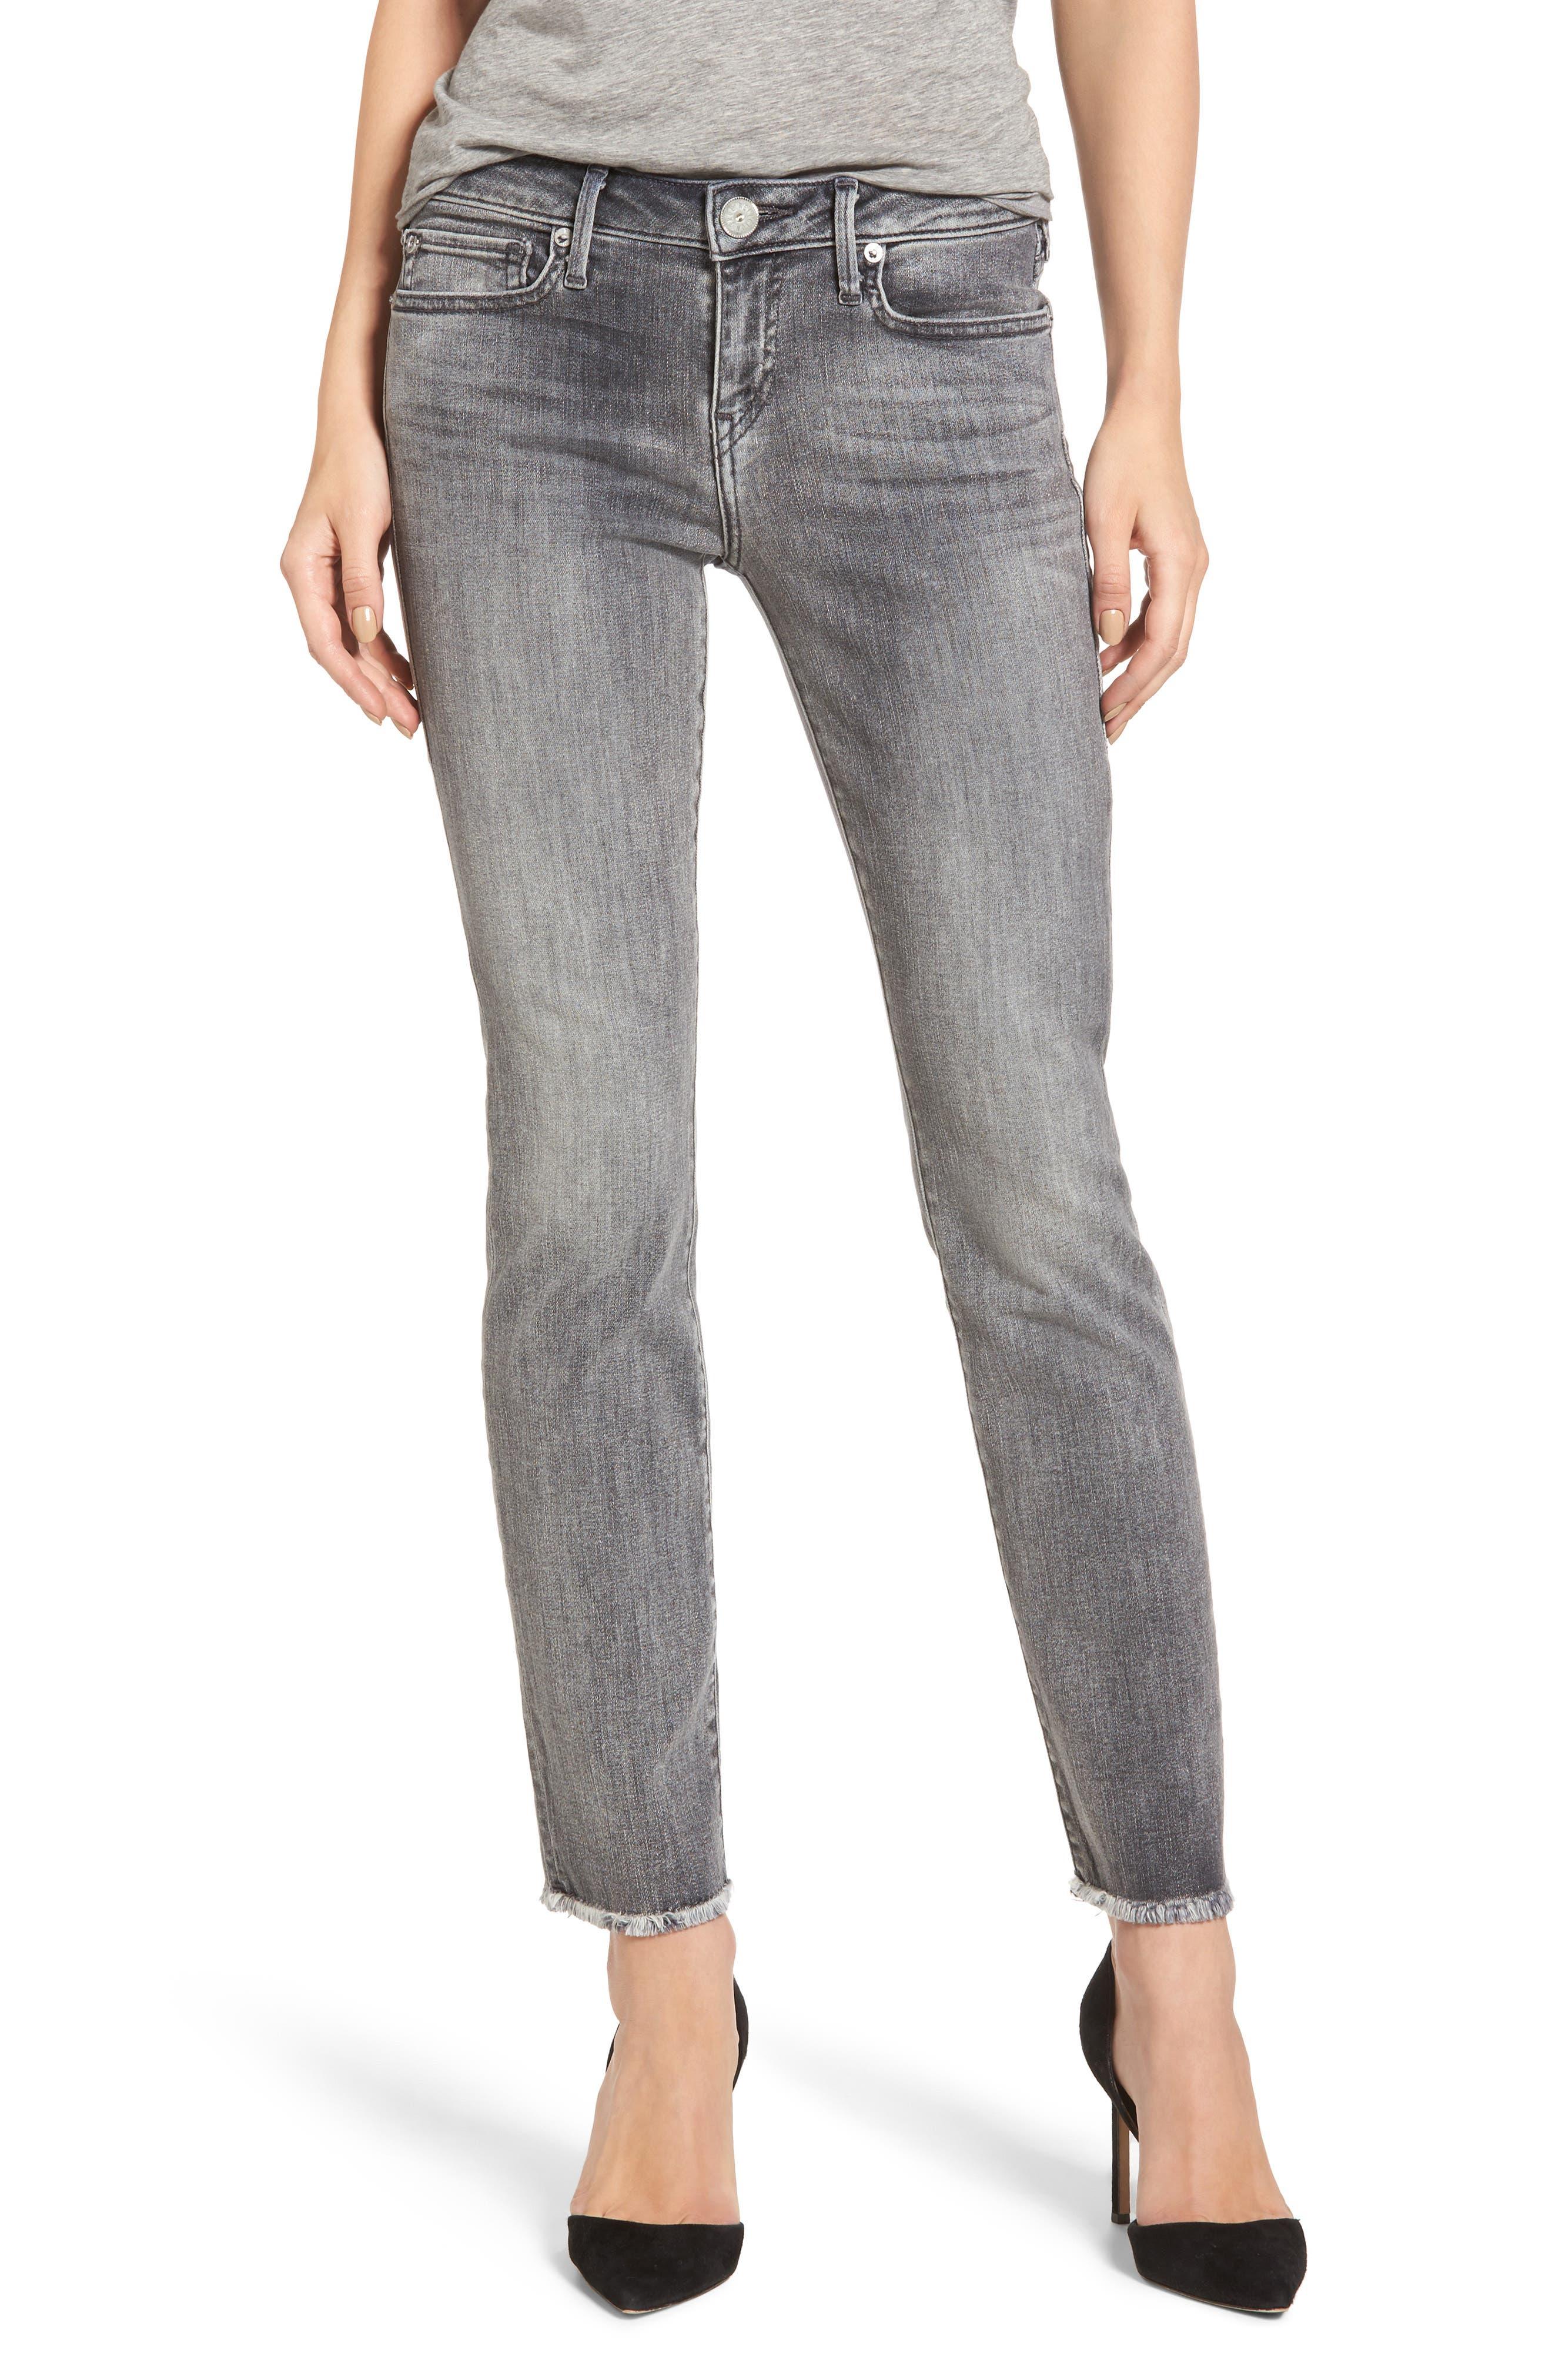 Main Image - True Religion Brand Jeans Sara Crop Cigarette Jeans (Eternal Grey)